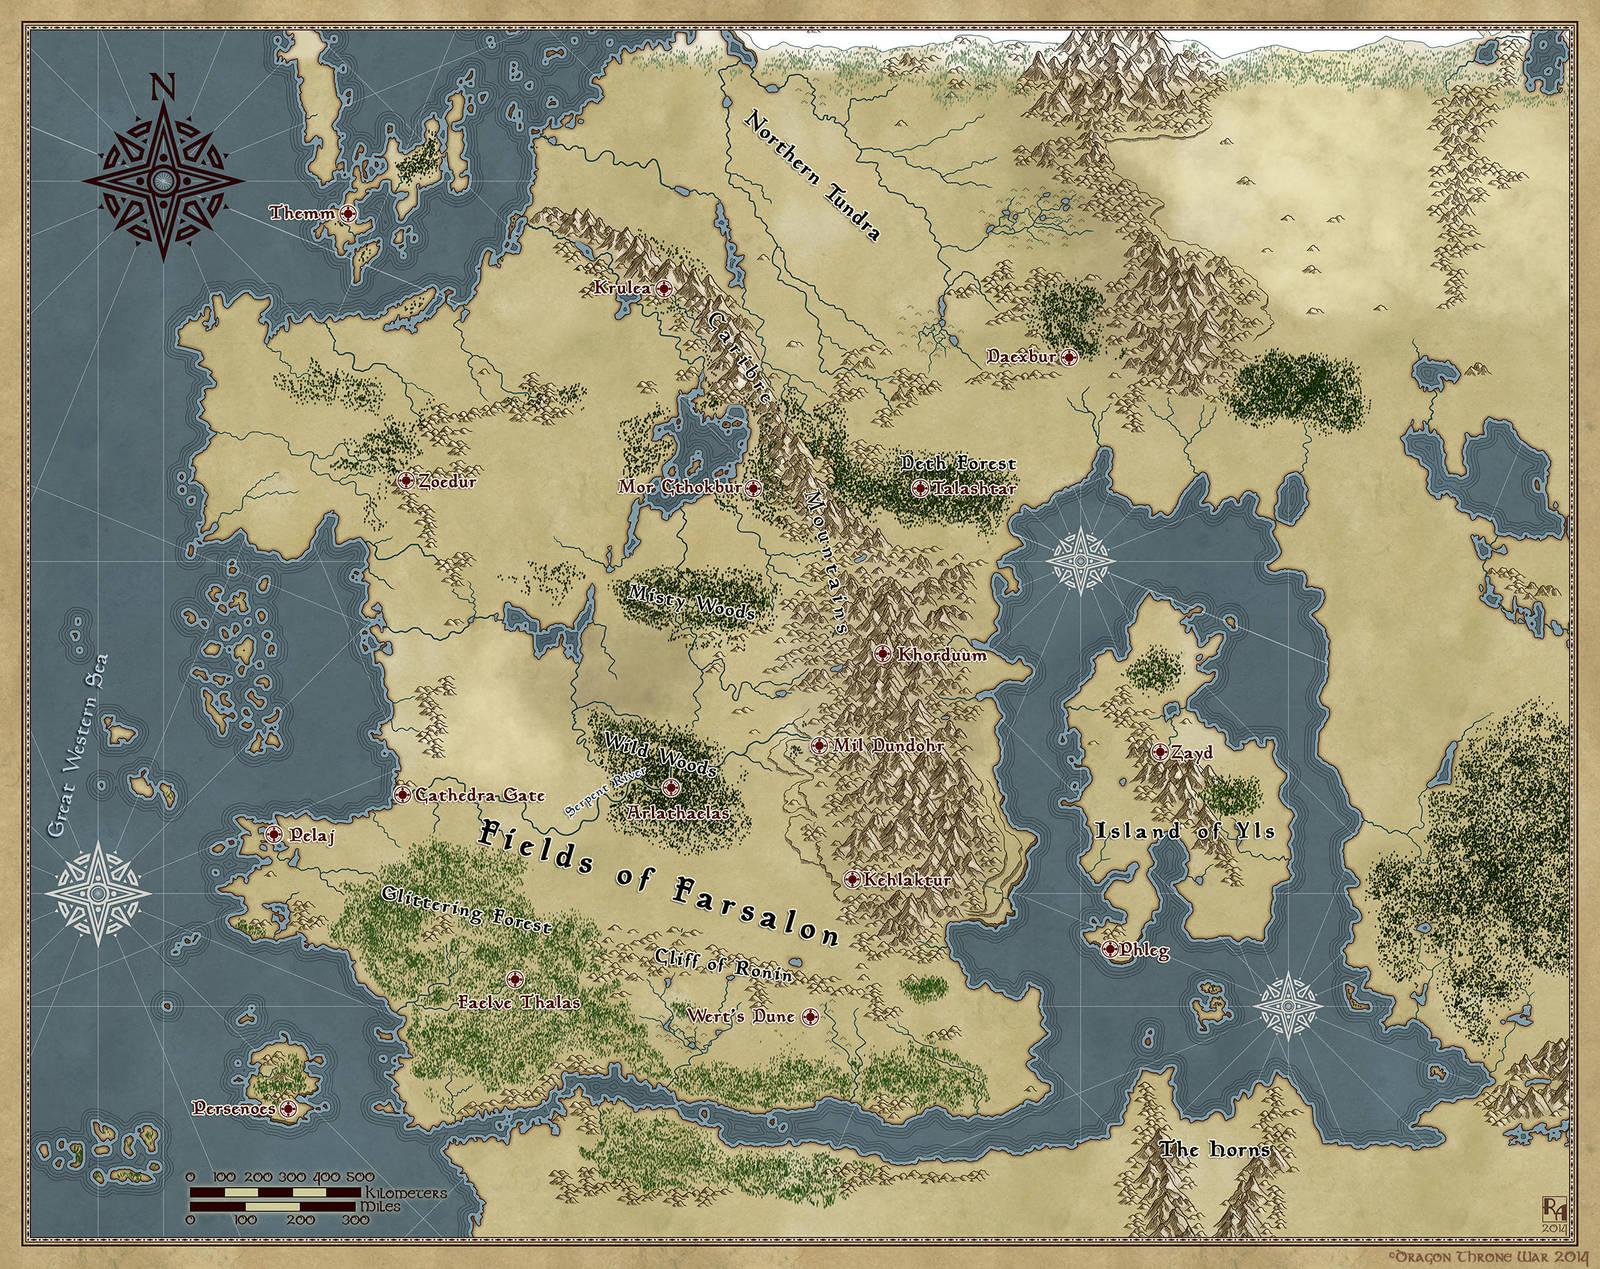 The World of Calibran by Sapiento